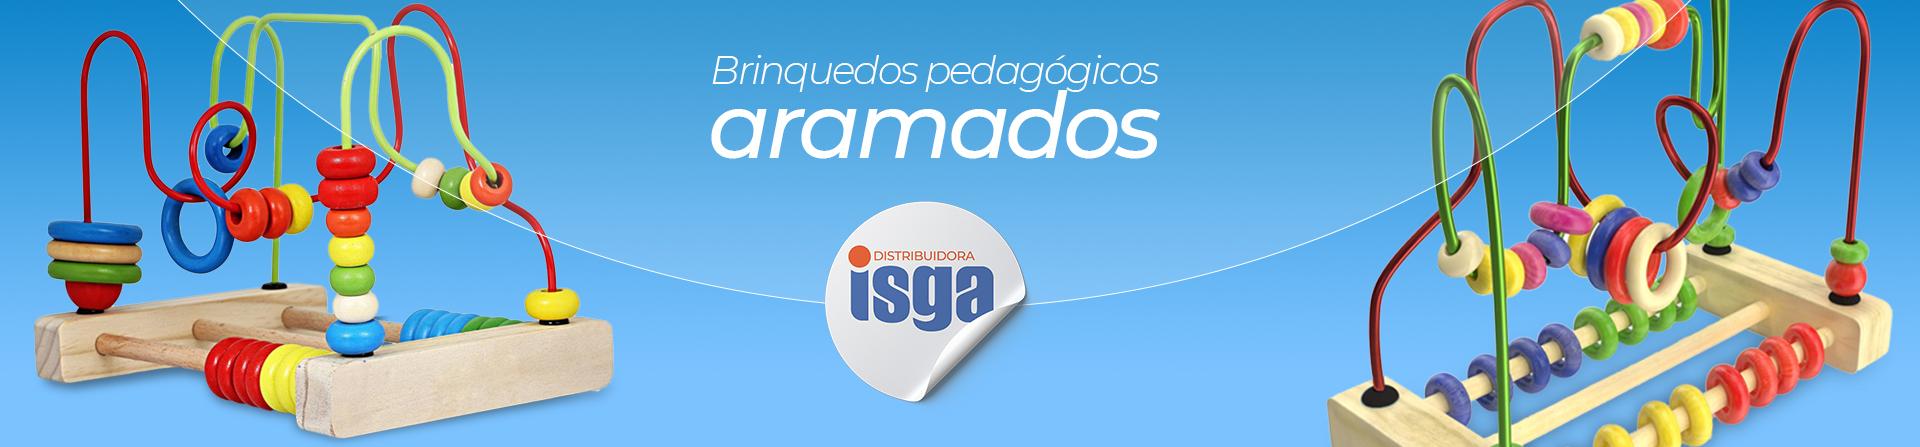 Brinquedos aramados - ISGA